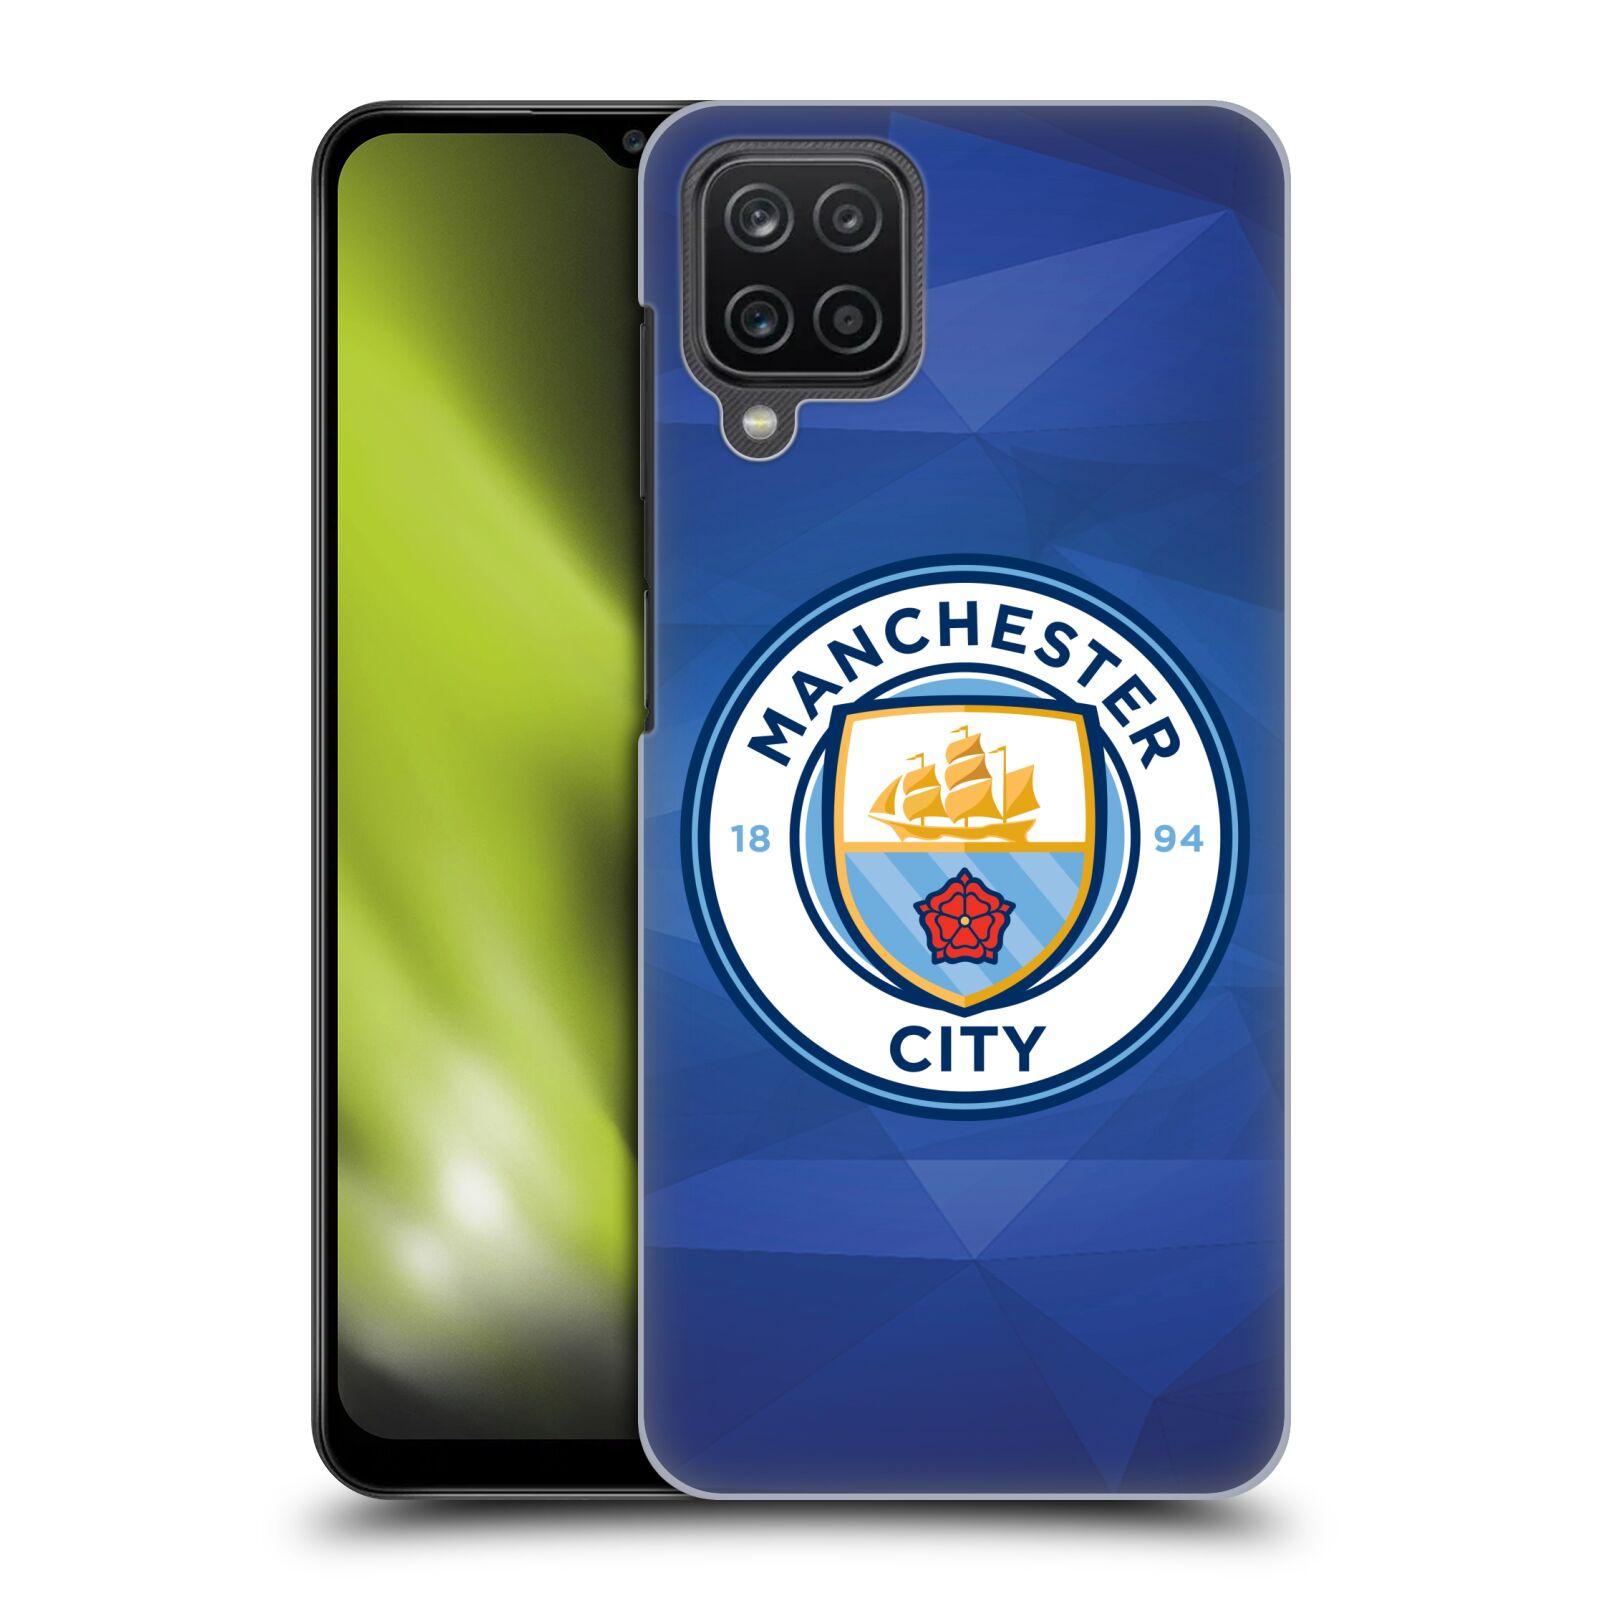 Plastové pouzdro na mobil Samsung Galaxy A12 - Head Case - Manchester City FC - Modré nové logo